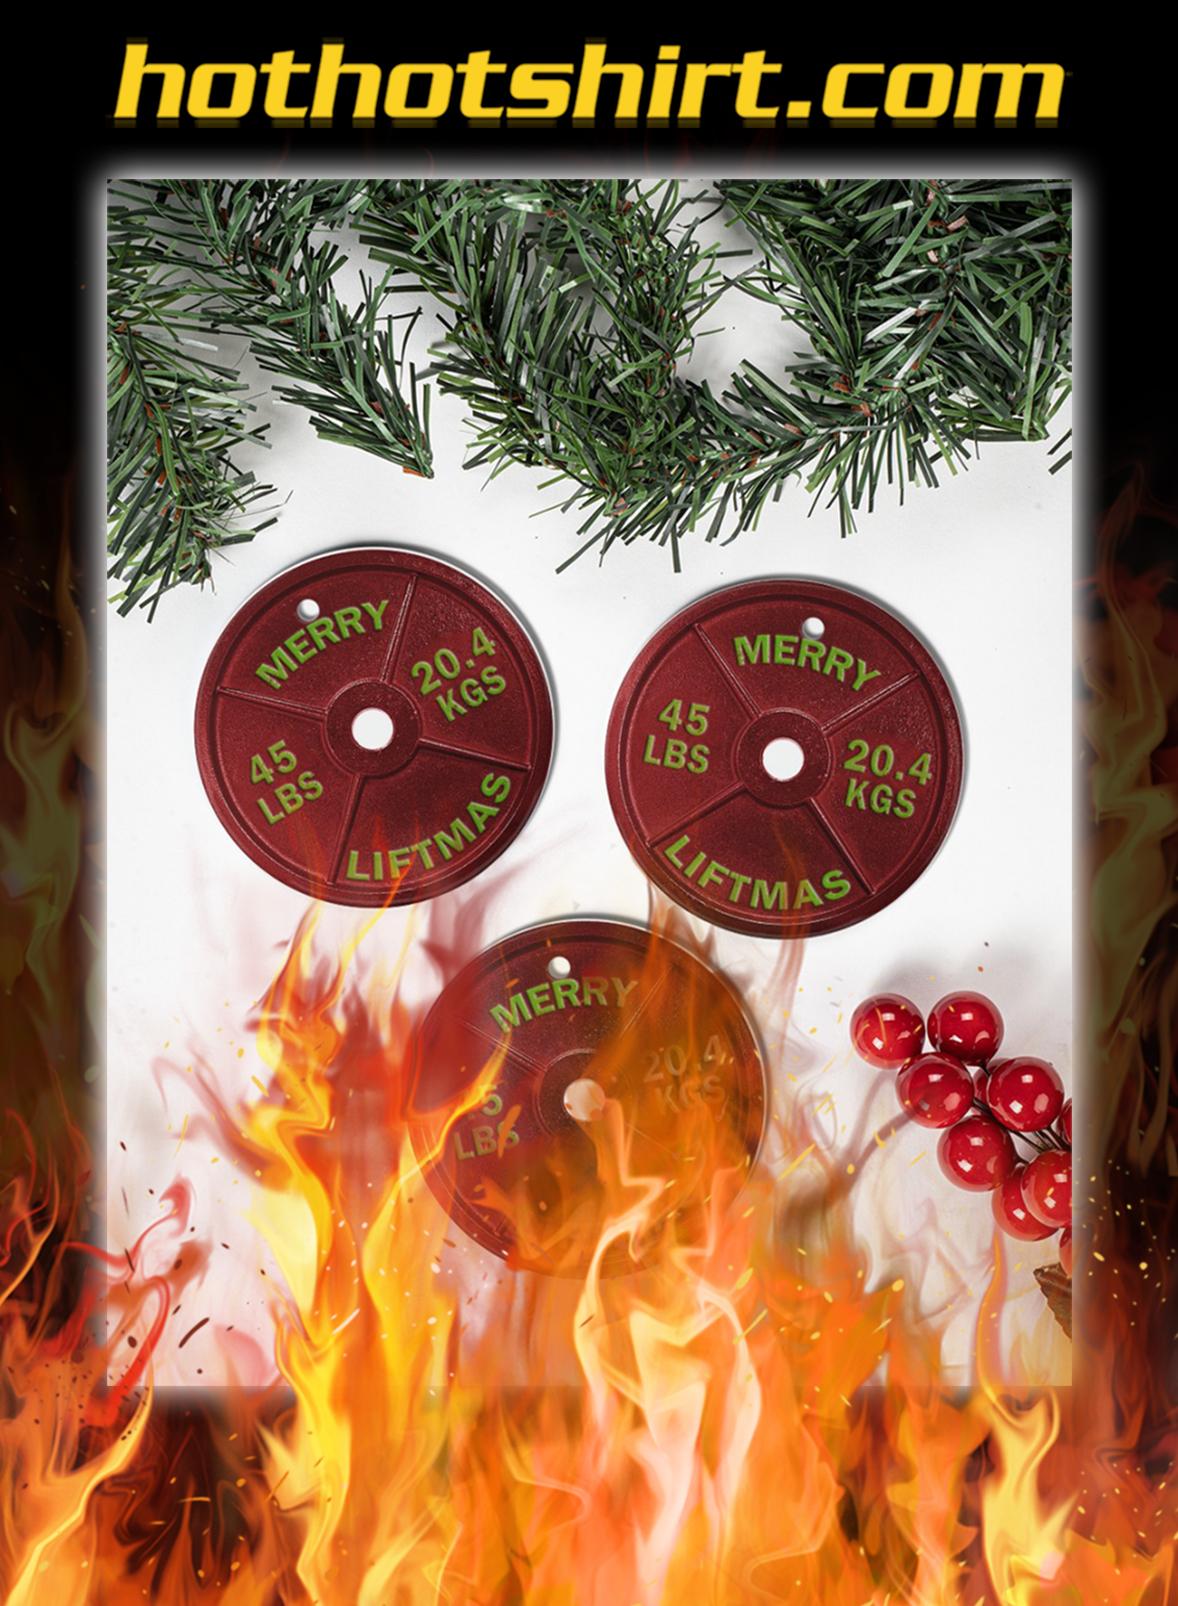 Weightlifting Merry Liftmas Christmas Circle Ornament- pic 1